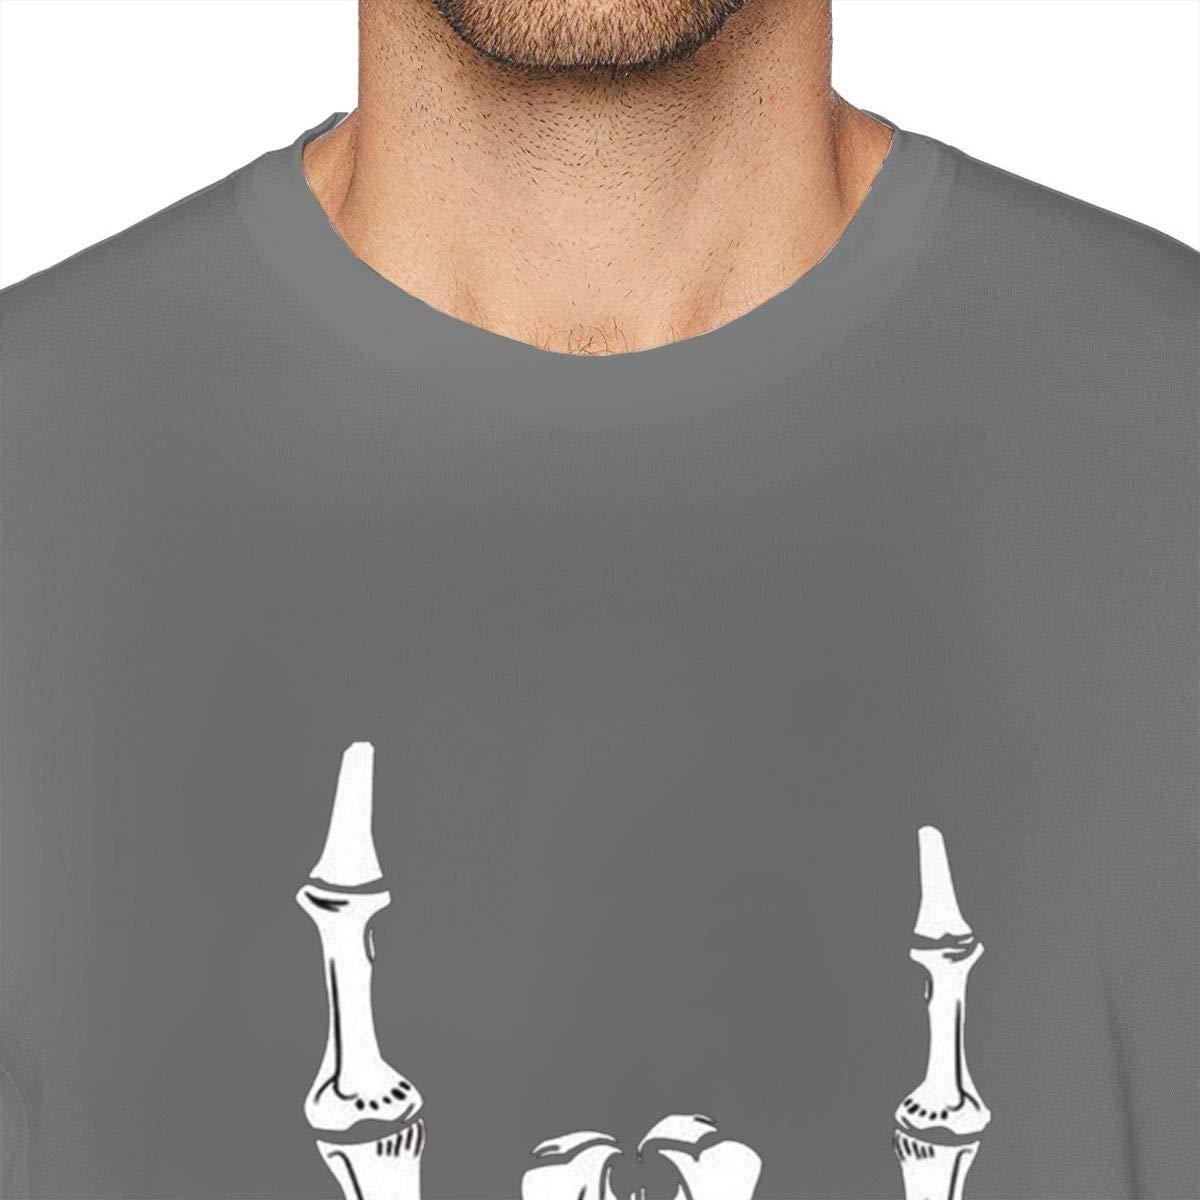 SUMT4men Human Skeleton Mens Crew Neck Short Sleeve T-Shirt Casual Shirt for Men